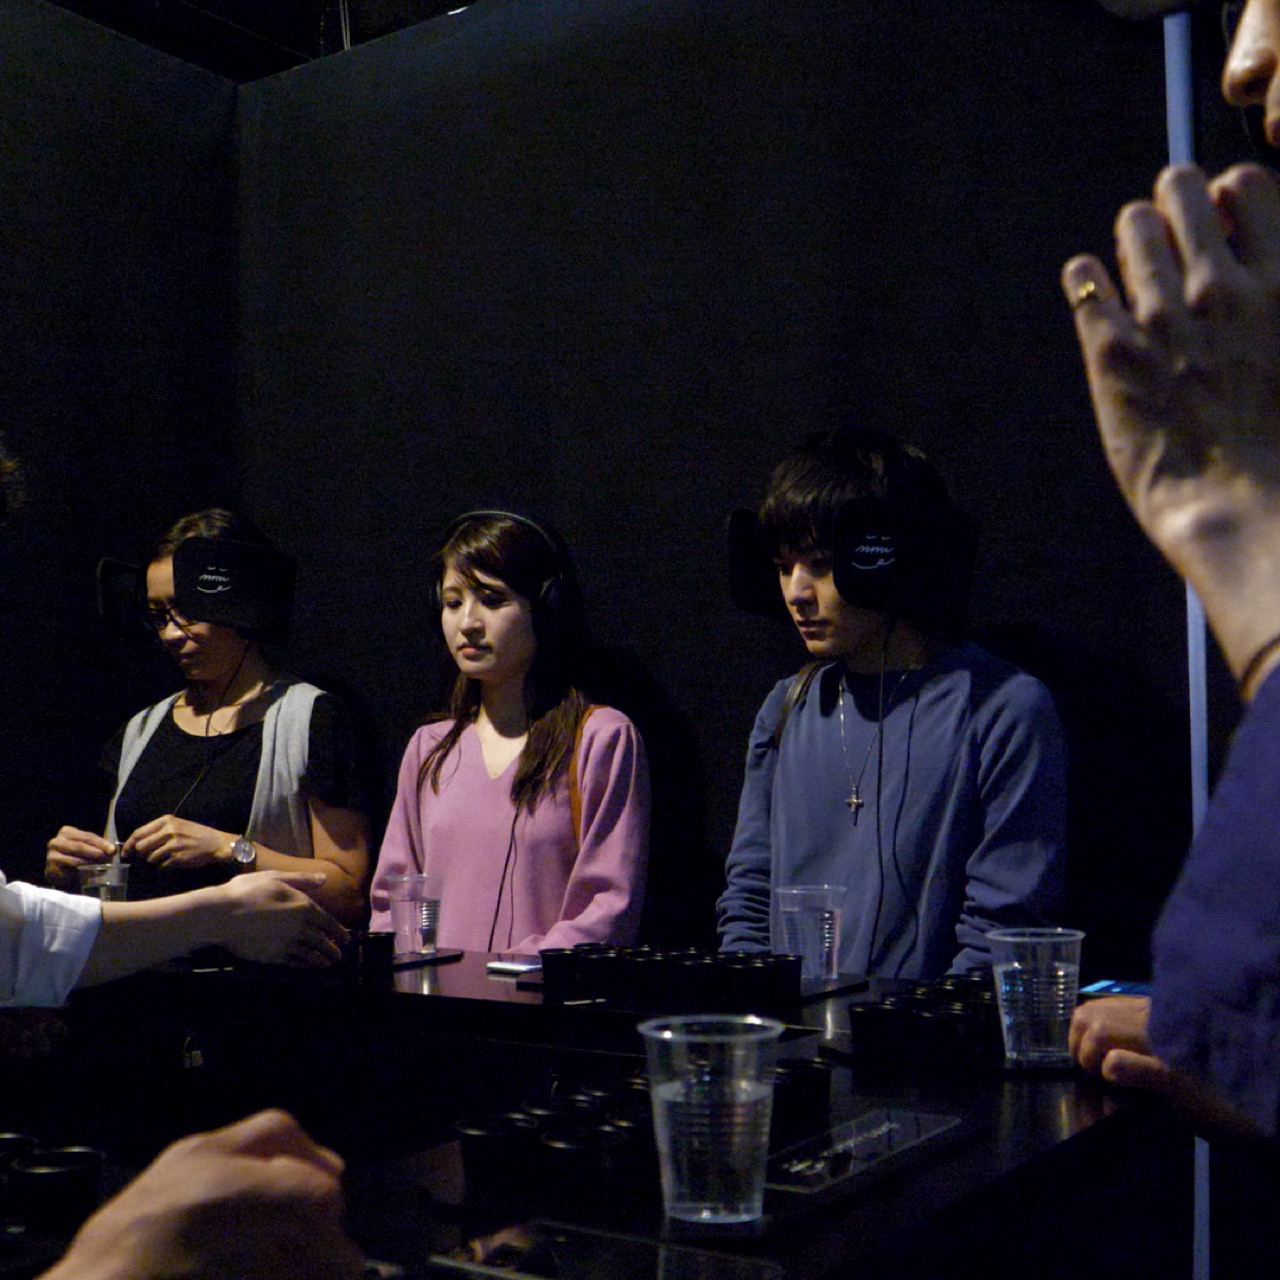 AIが日本酒選びをサポート?「YUMMY SAKE WEEK」が渋谷で開催